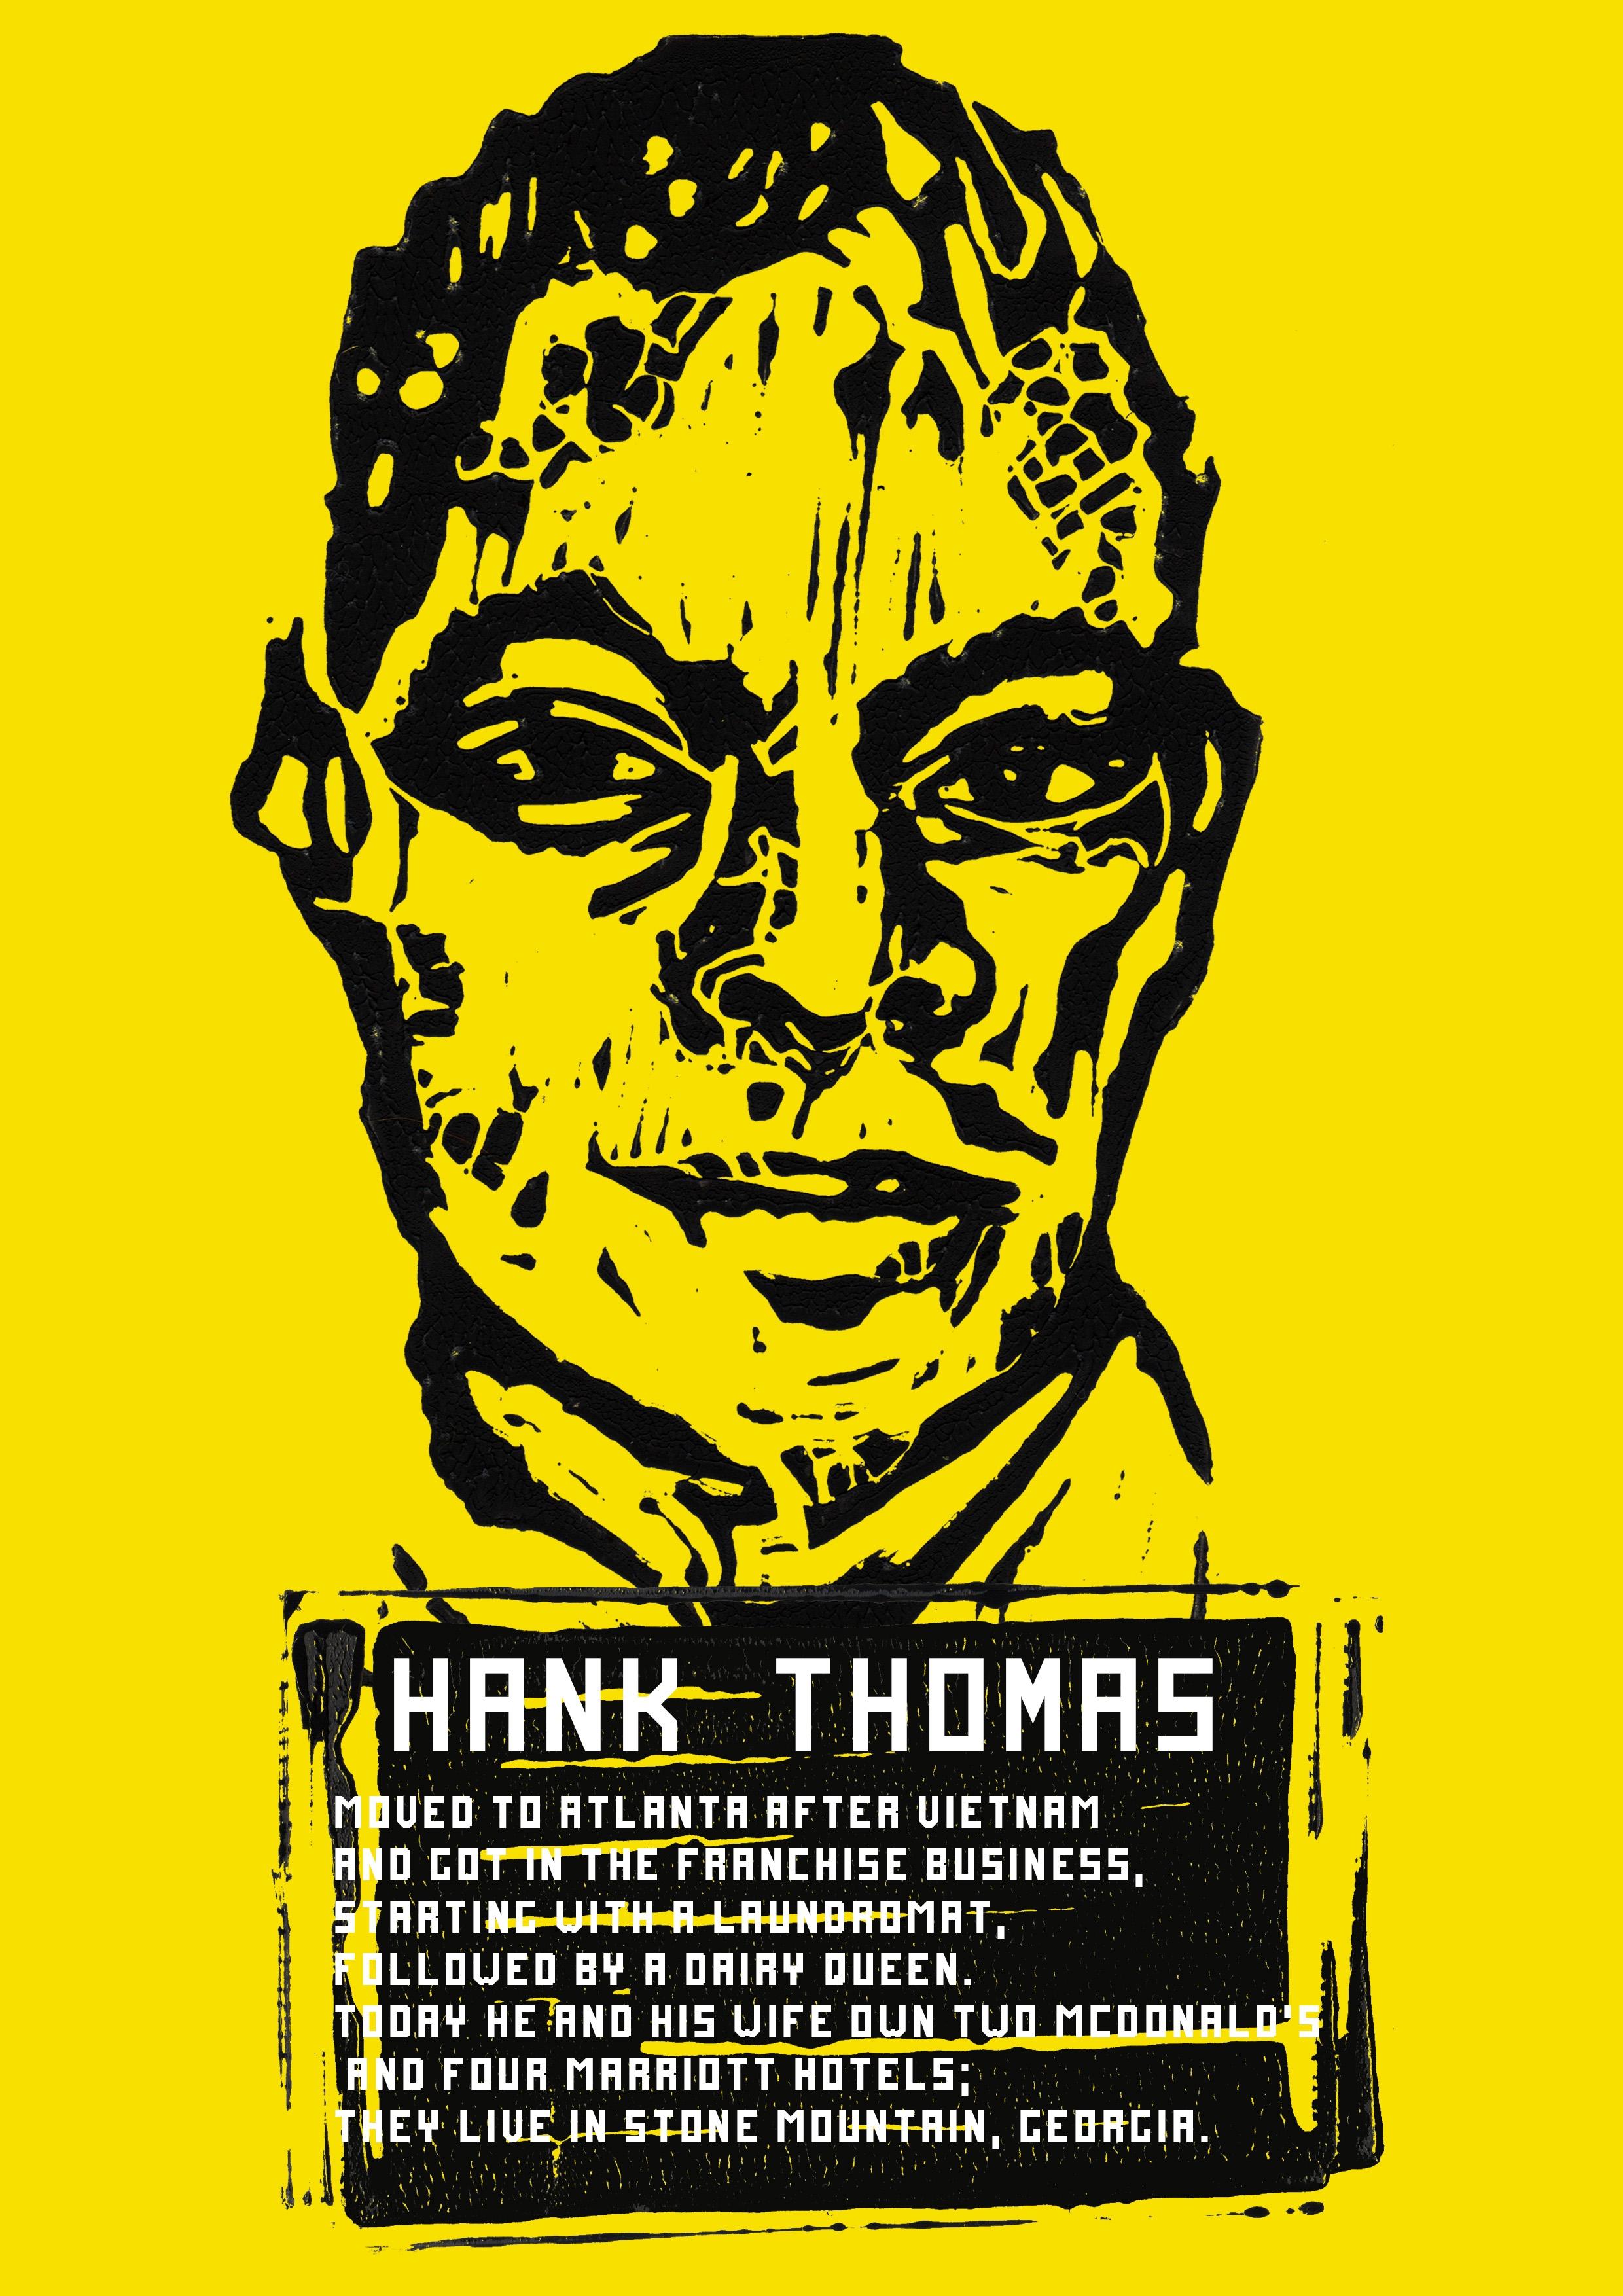 Hank Thomas